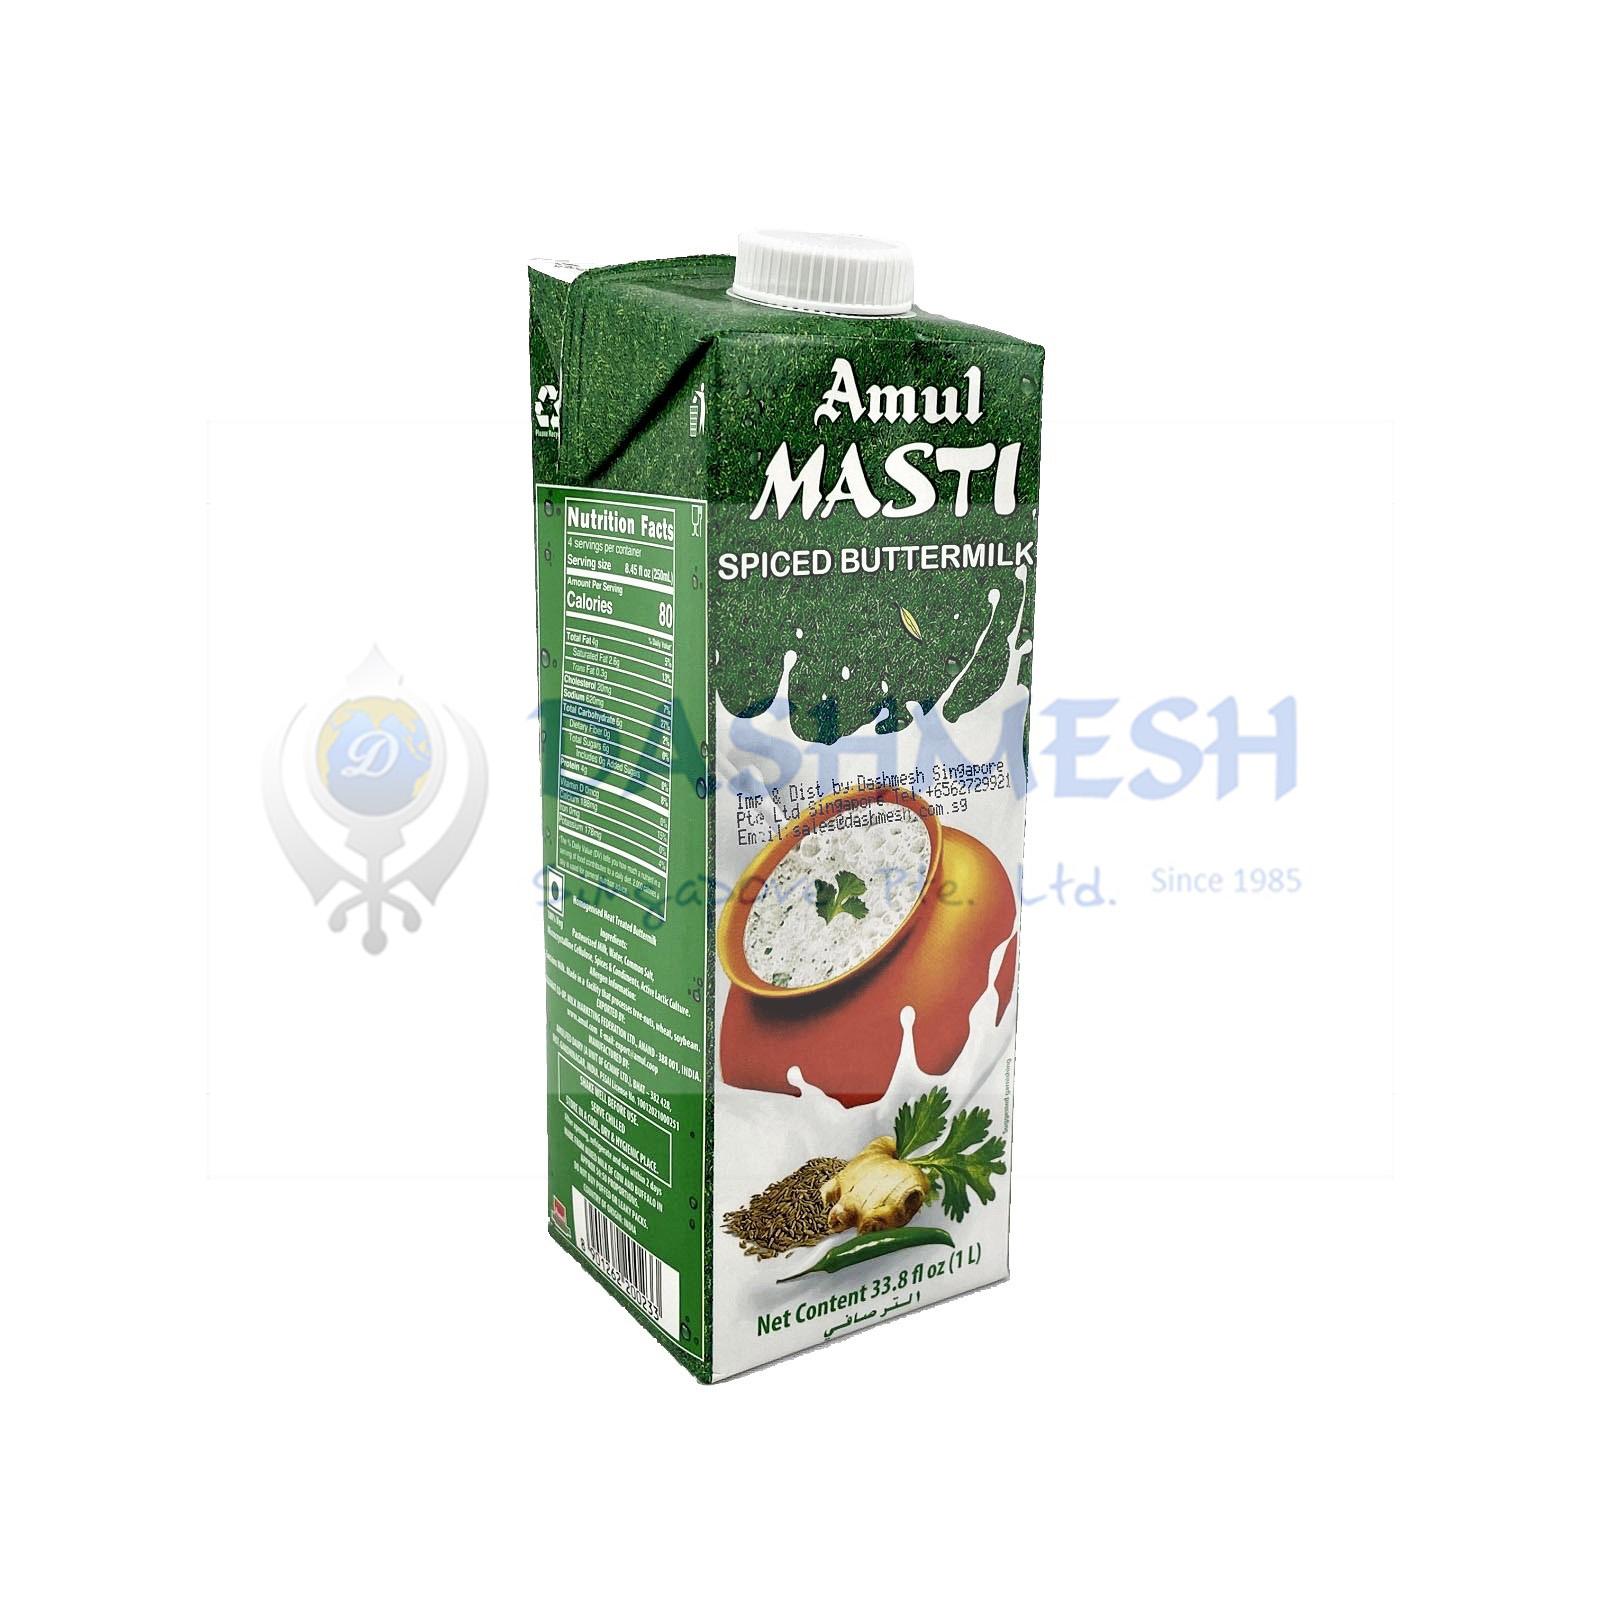 Amul Masti Spiced Buttermilk 200ml & 1 ltr